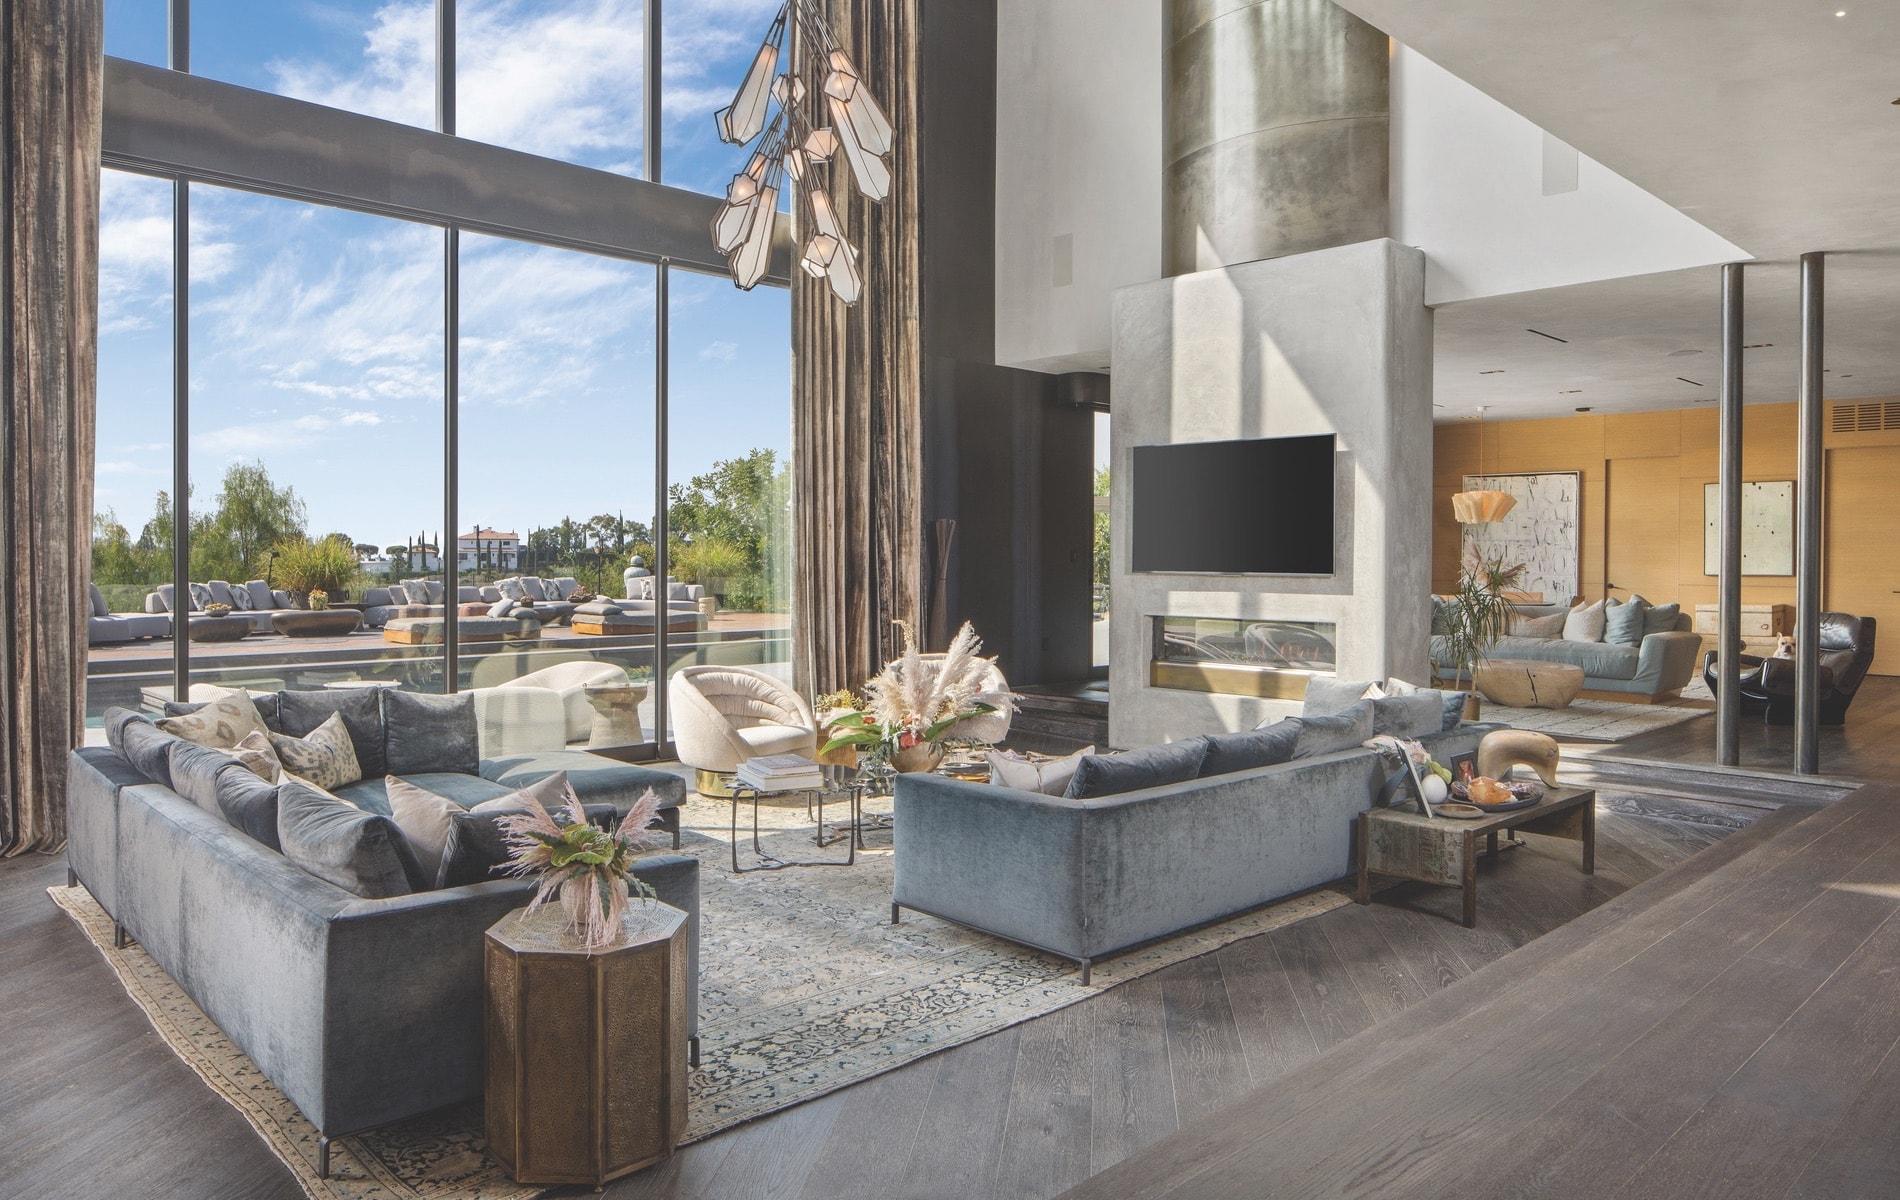 Top Ten Real Estate Deals, John Legend, Chrissy Teigen, Douglas Elliman, Douglas Elliman Beverly Hills